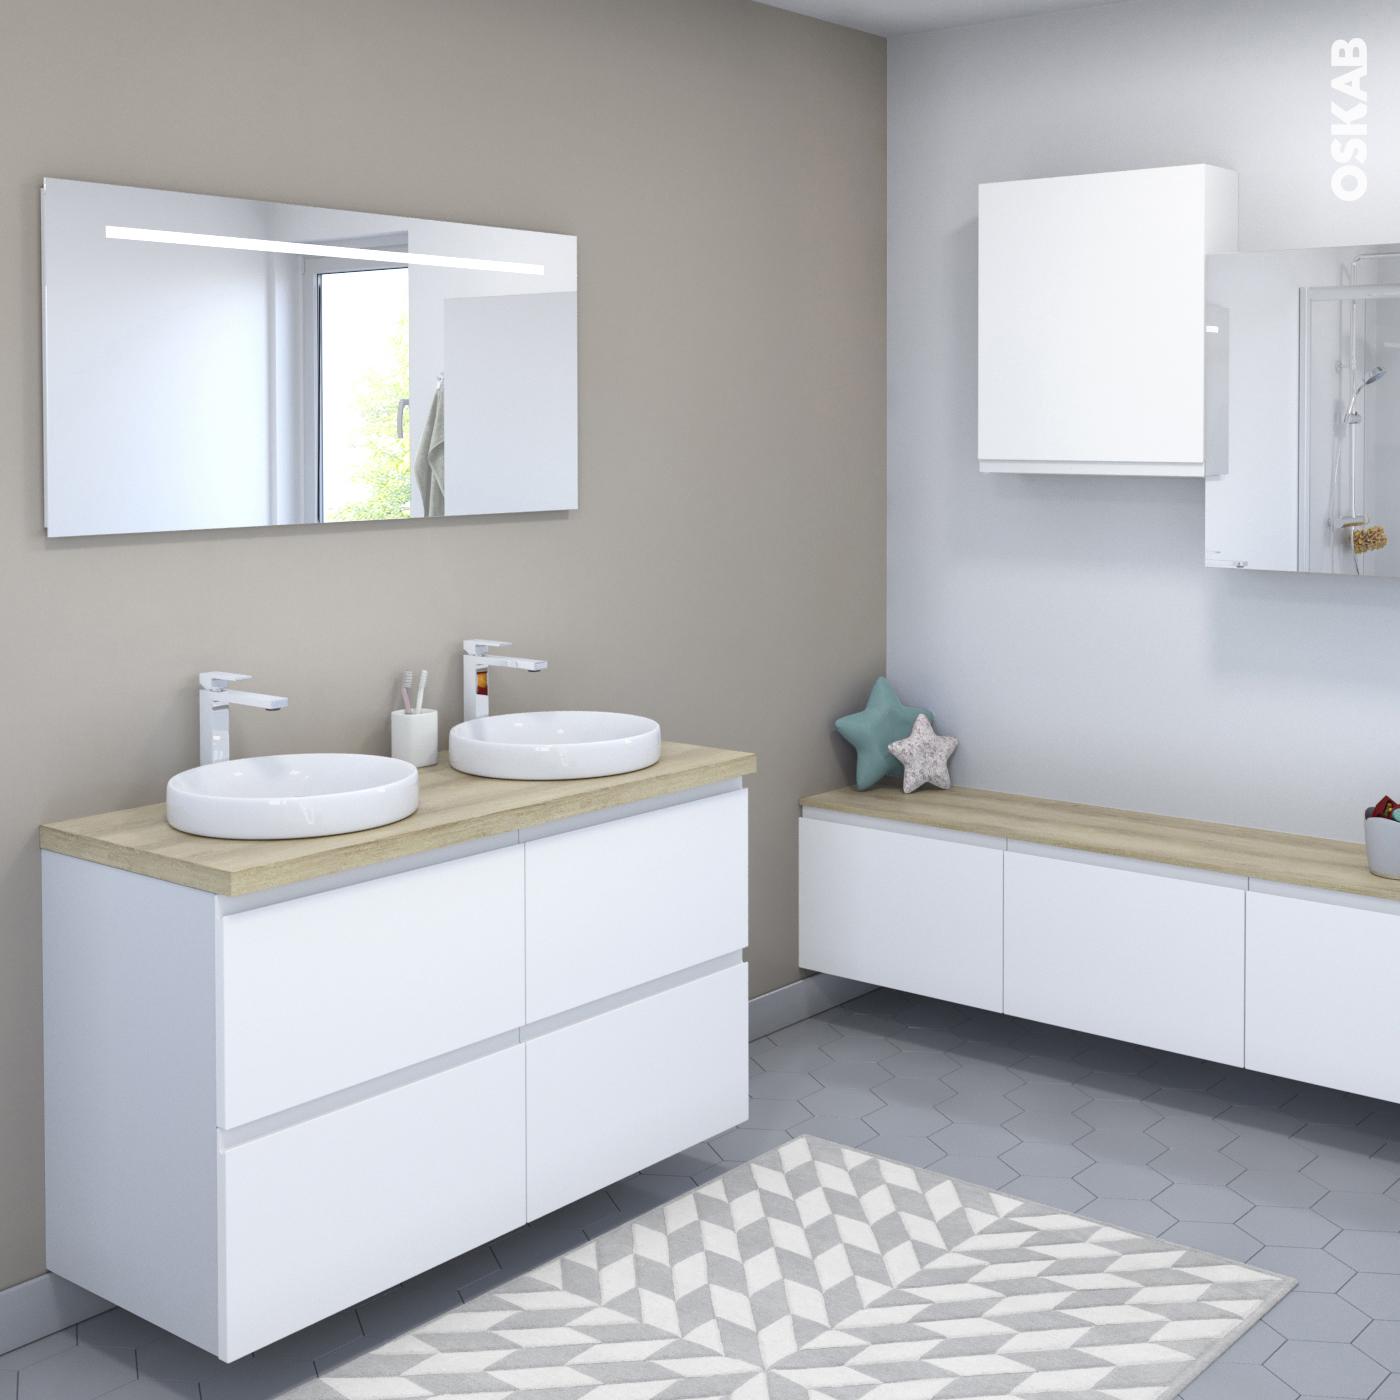 meuble - salle de bains ipoma - blanc mat - achat modèle de salle ... - Salle De Bains Blanche